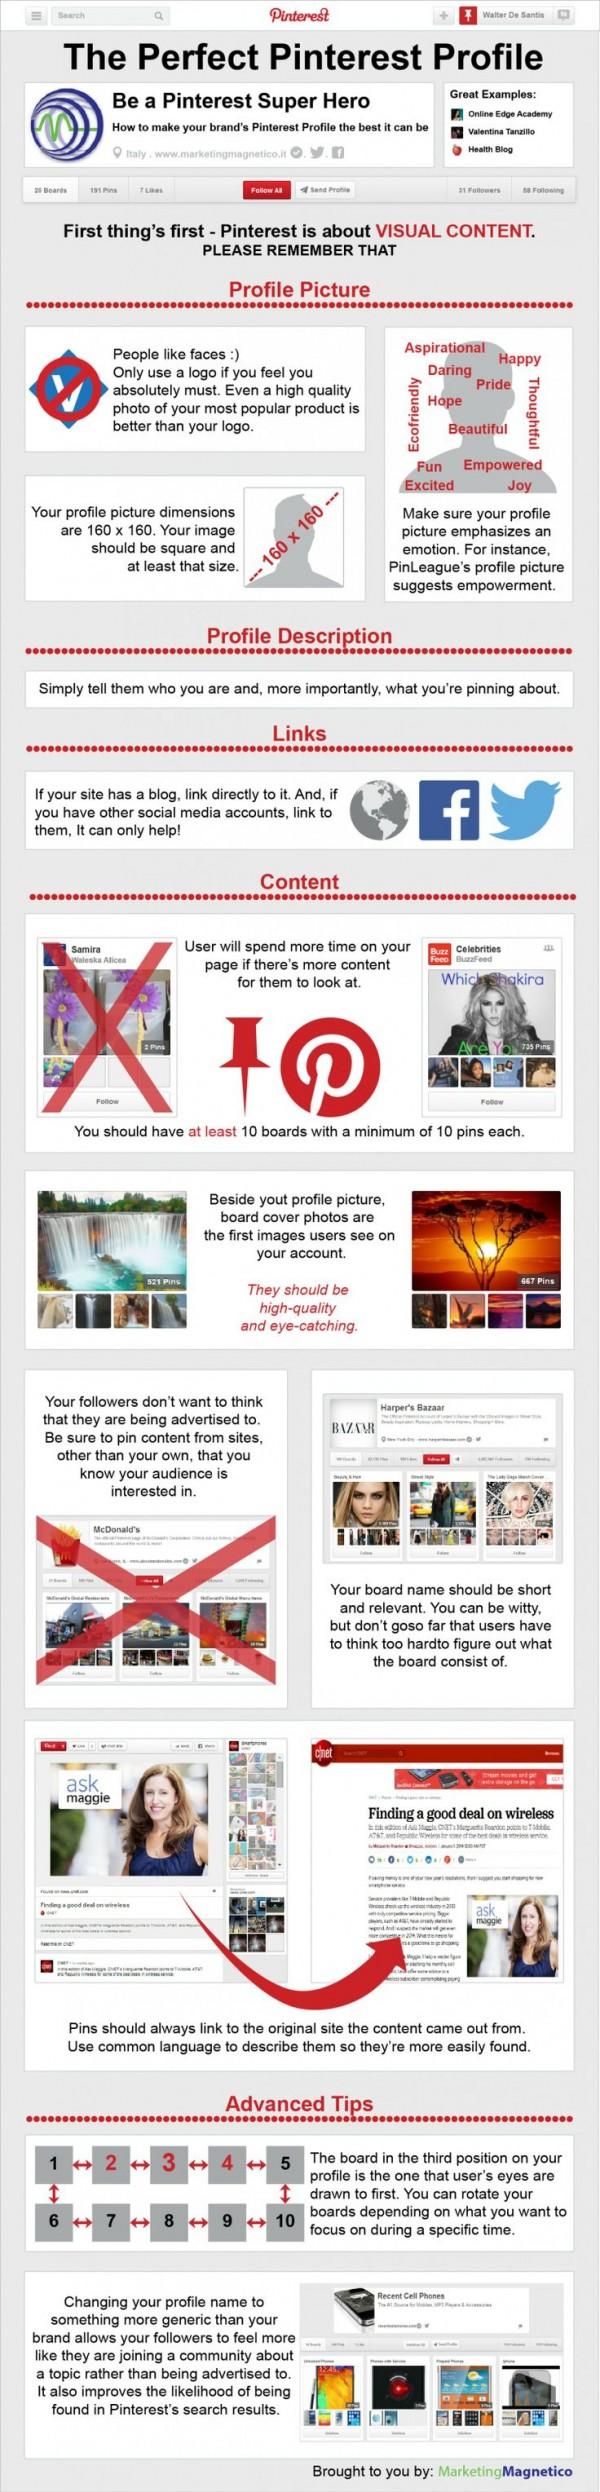 Consejos para un mejor perfil en Pinterest